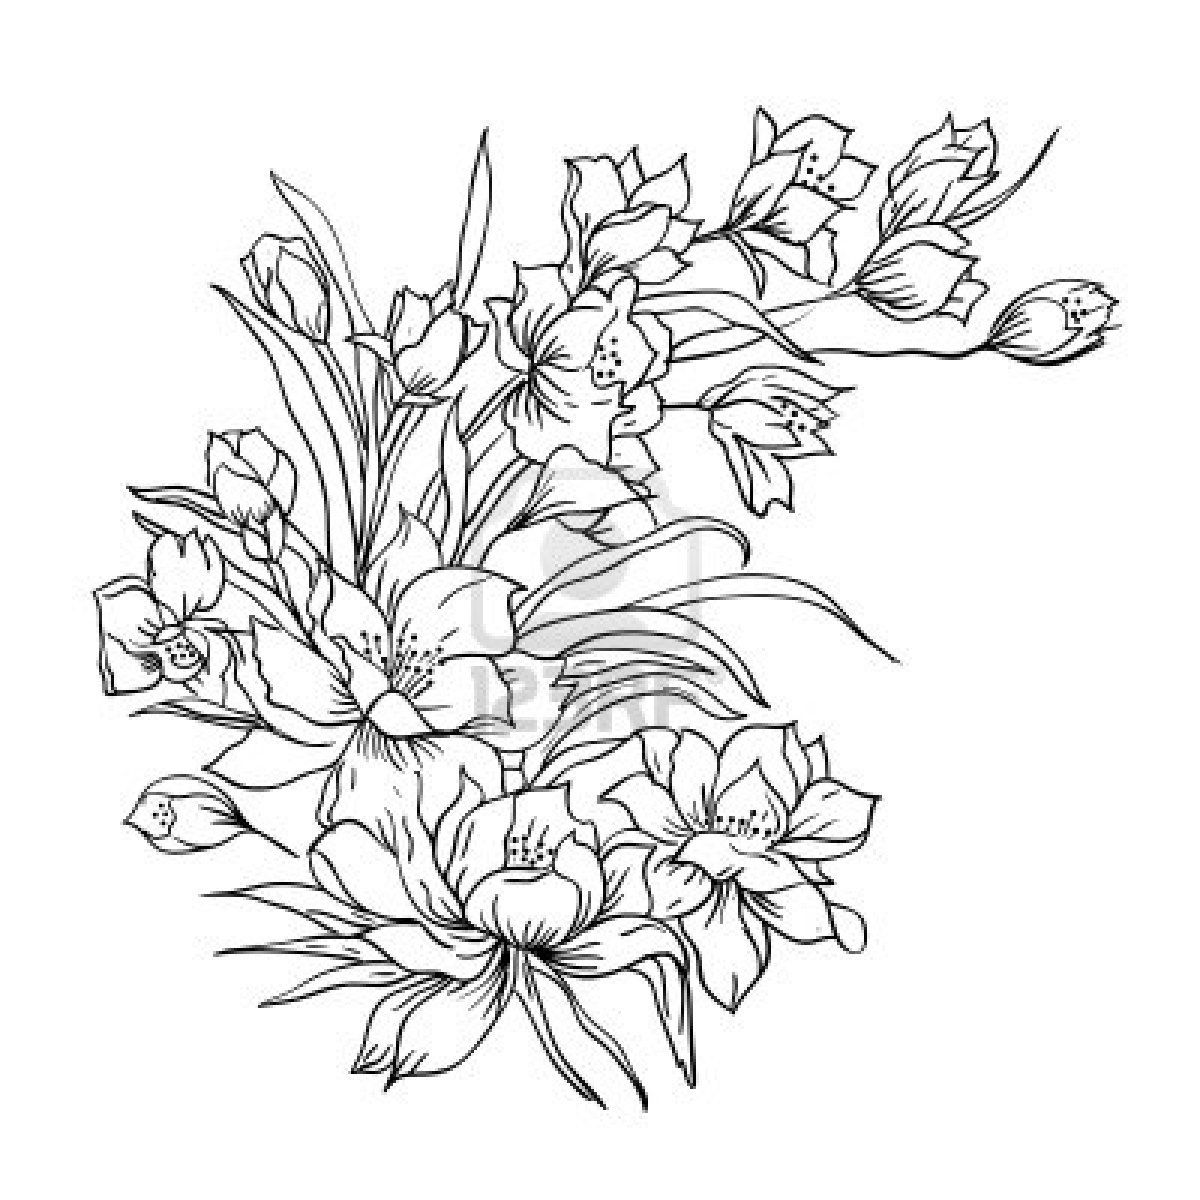 Dibujos de flores | Dibujos de ramos de flores | Fondos de pantalla de Ramos de flores